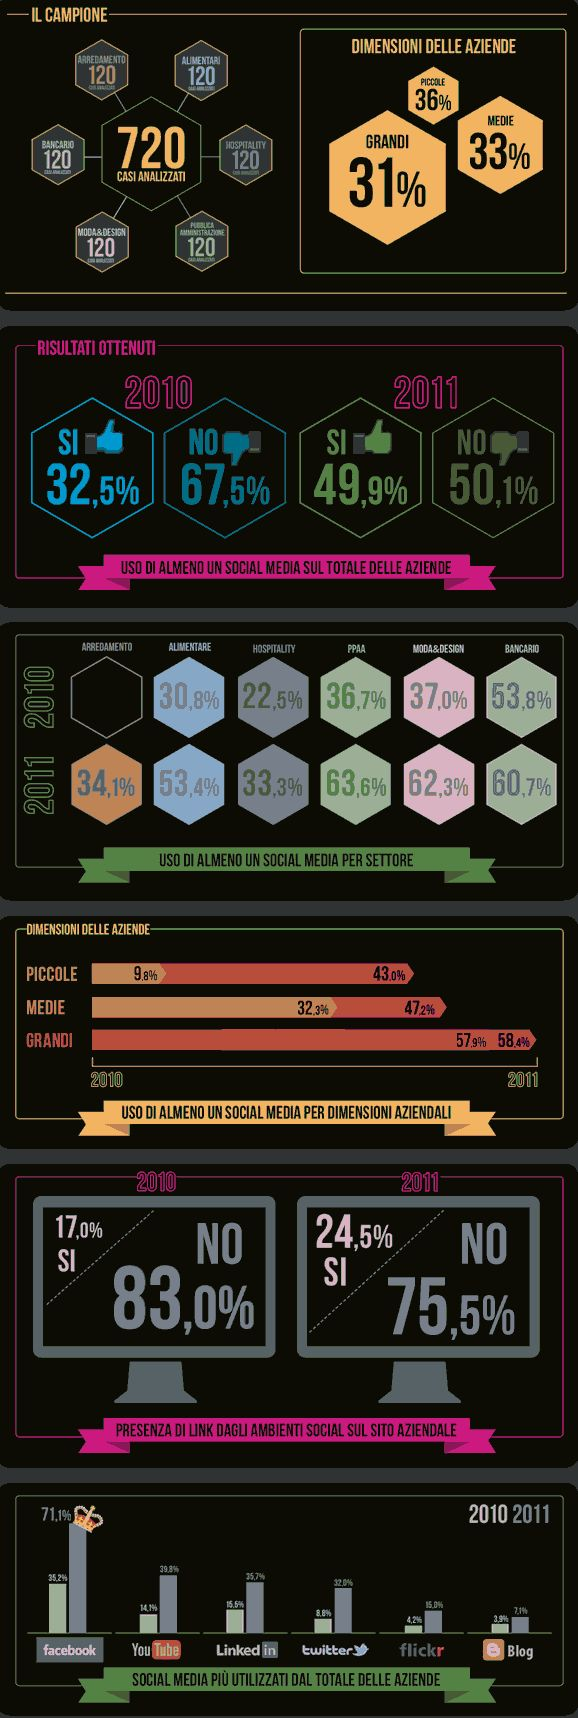 Quante imprese utilizzano i social media?   http://womseo.com/social-media-marketing-ostacoli/